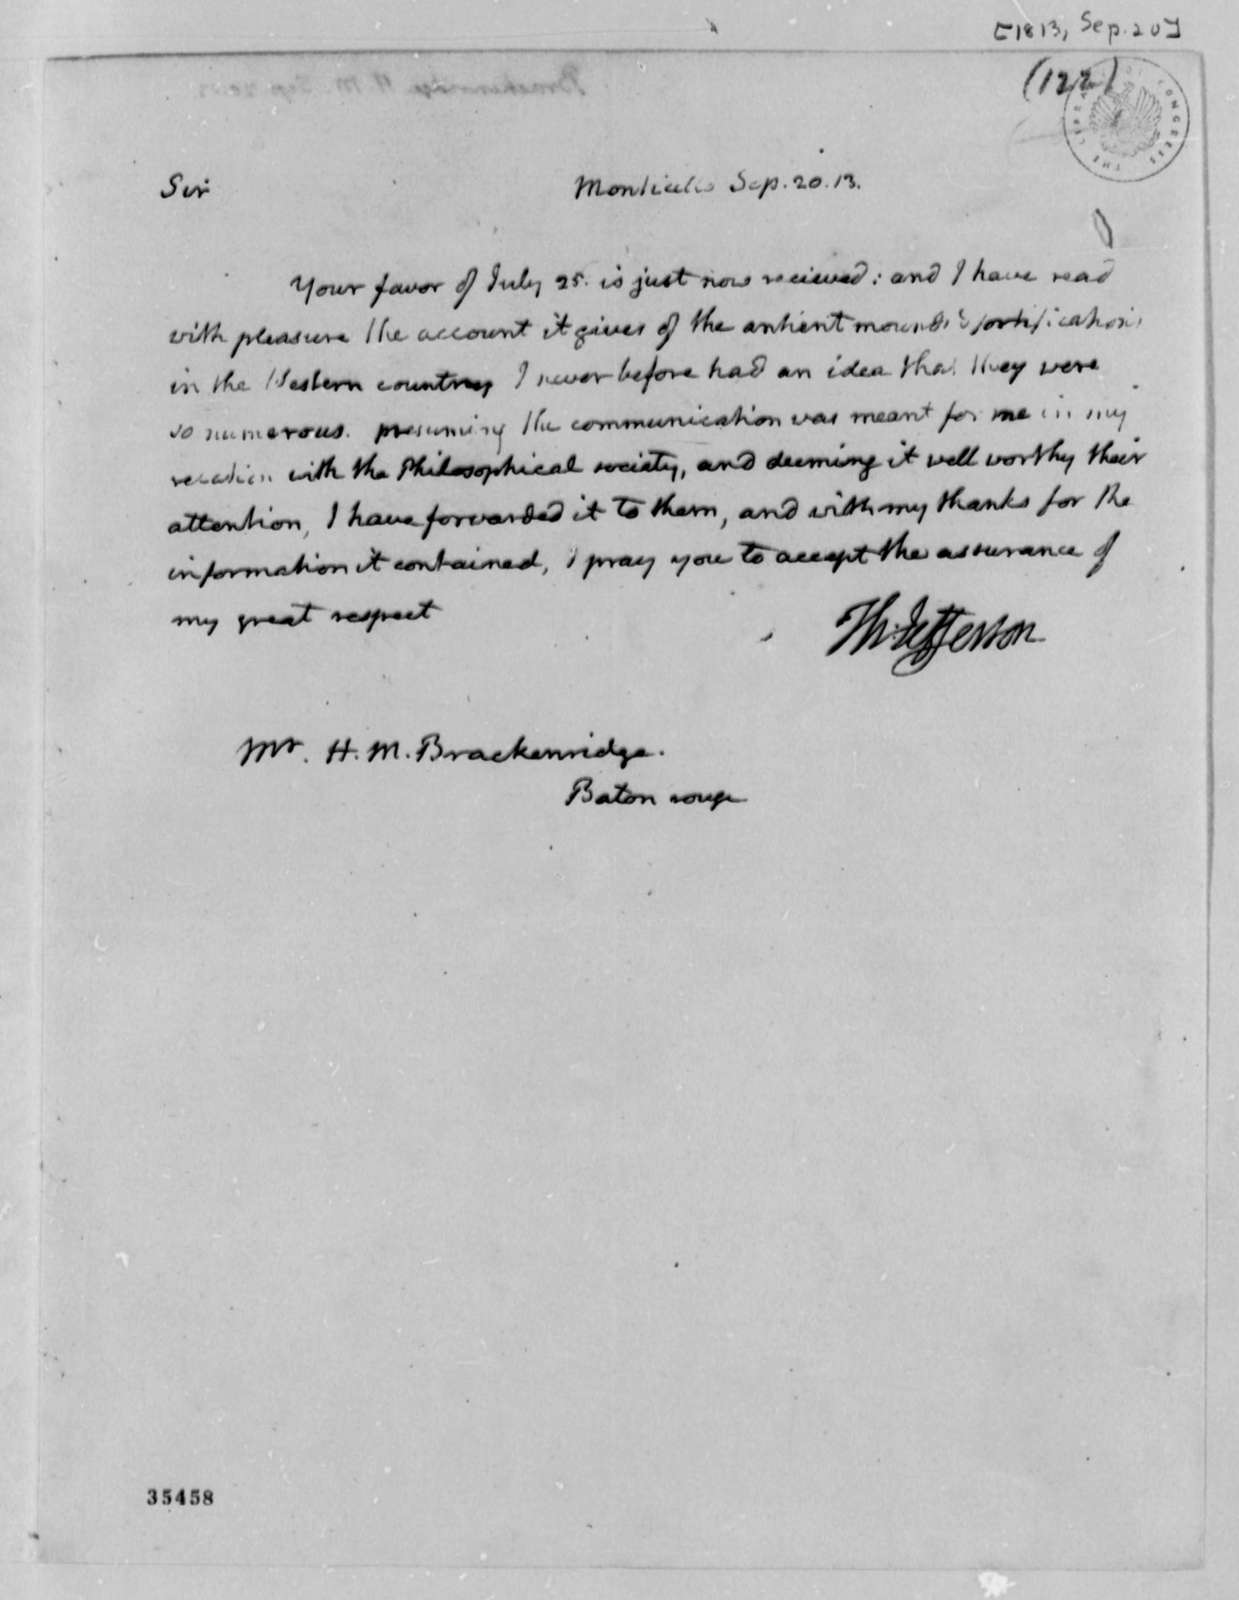 Thomas Jefferson to Henry Marie Brackenridge, September 20, 1813